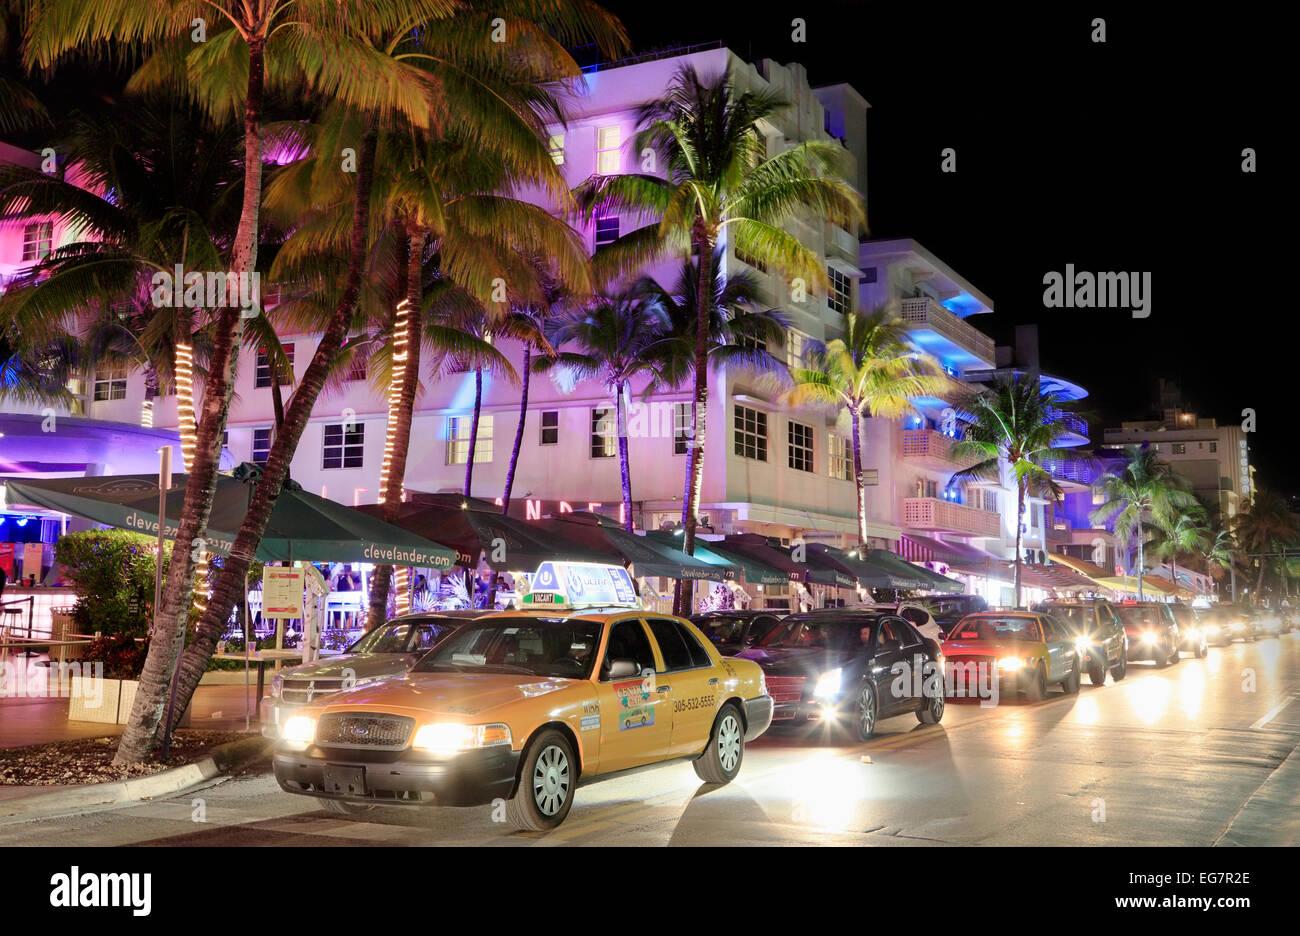 south-beach-miami-florida-heavy-traffic-